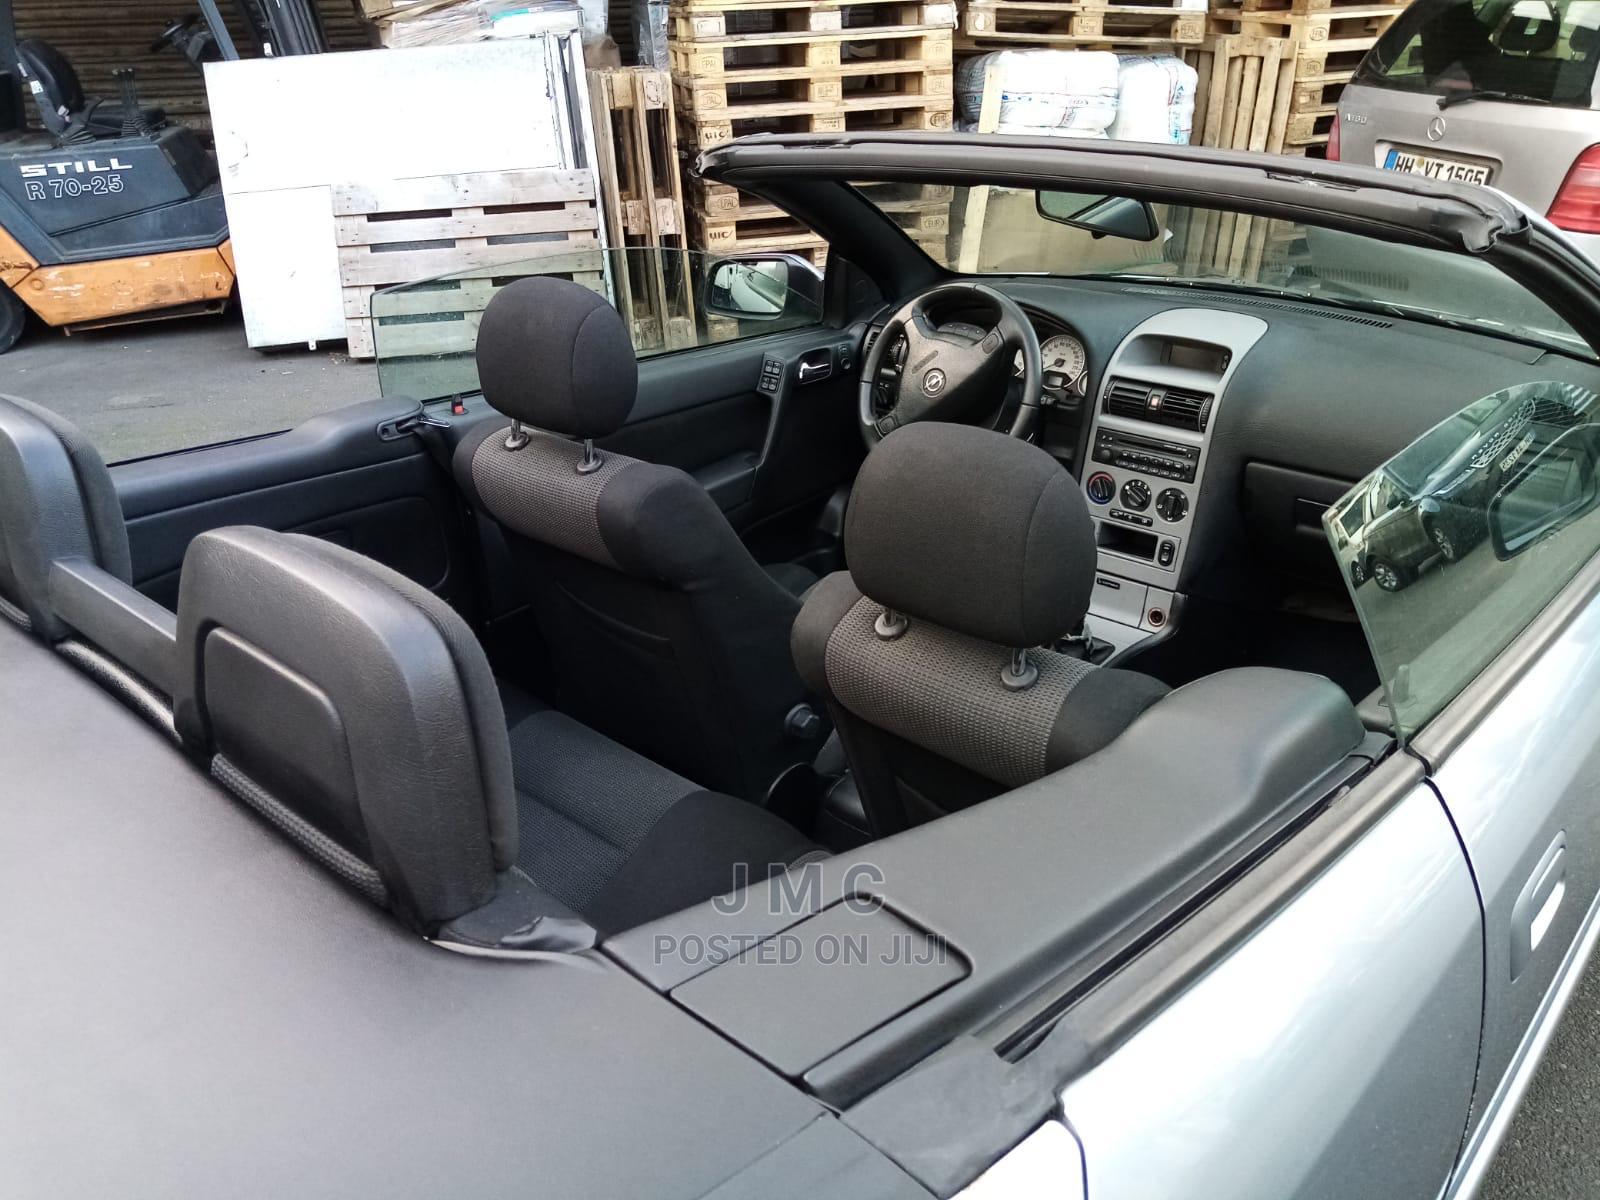 Opel Astra 2006 GTC 1.9 CDTi Sport   Cars for sale in Amuwo-Odofin, Lagos State, Nigeria